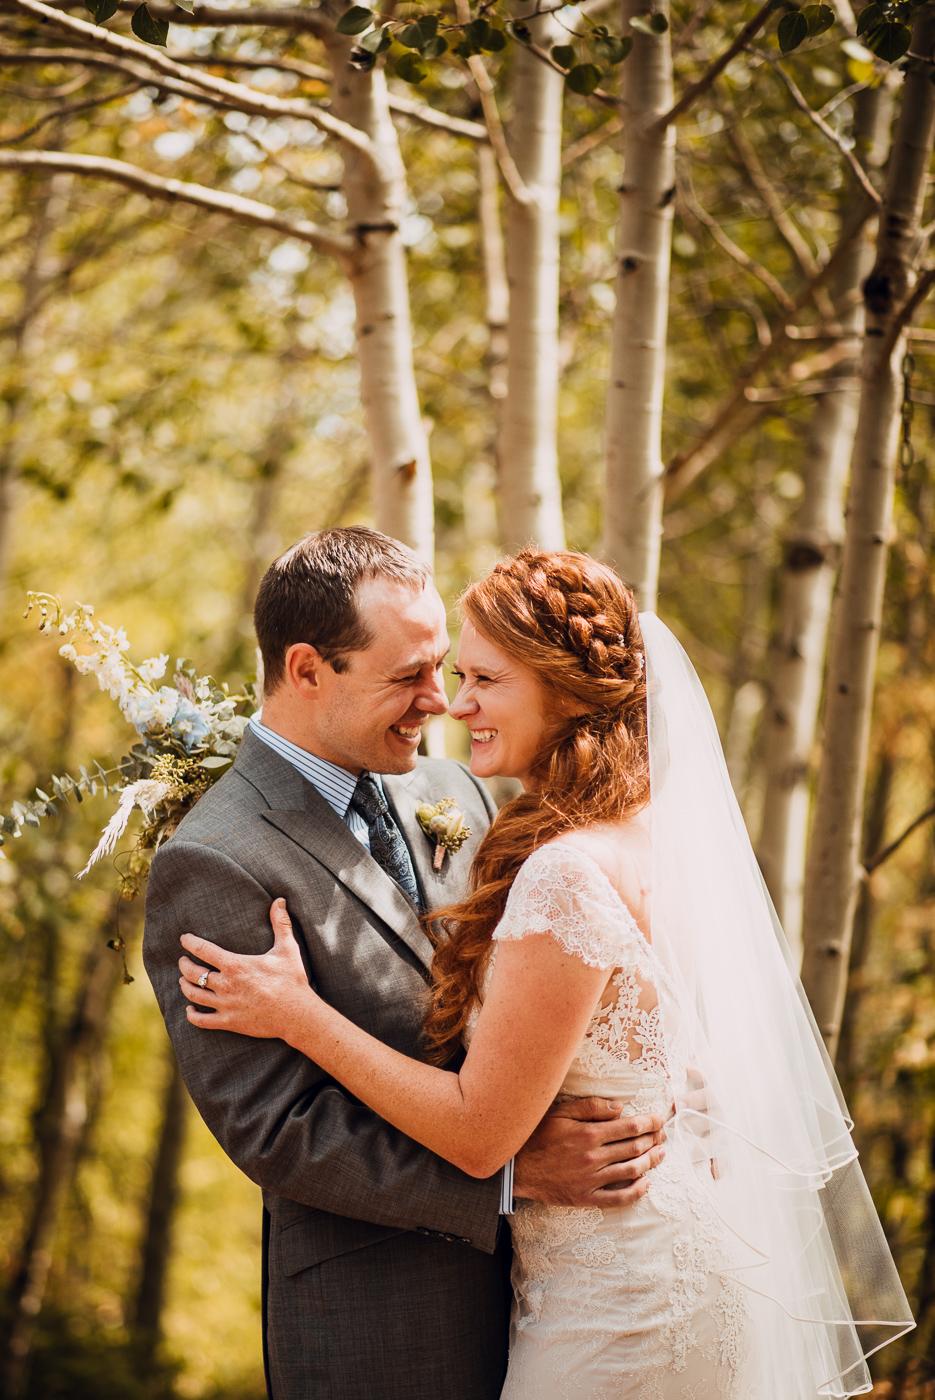 PHOCO Photography Fall Wedding Wild Basin Lodge Allenspark Estes Park Colorado-4.jpg